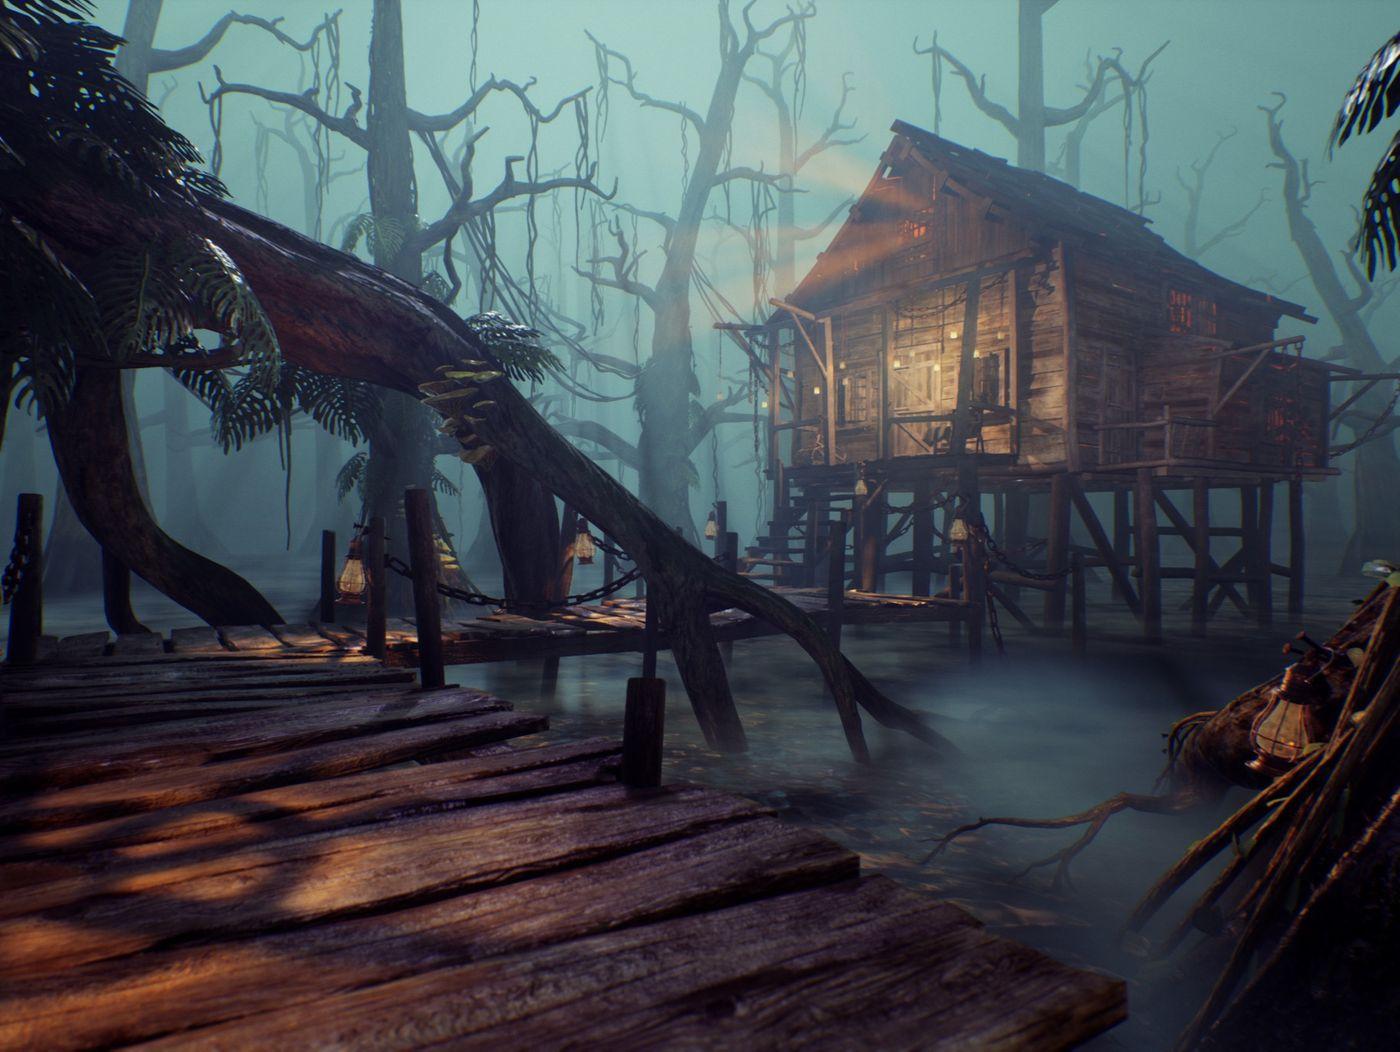 The Forbidden Swamp